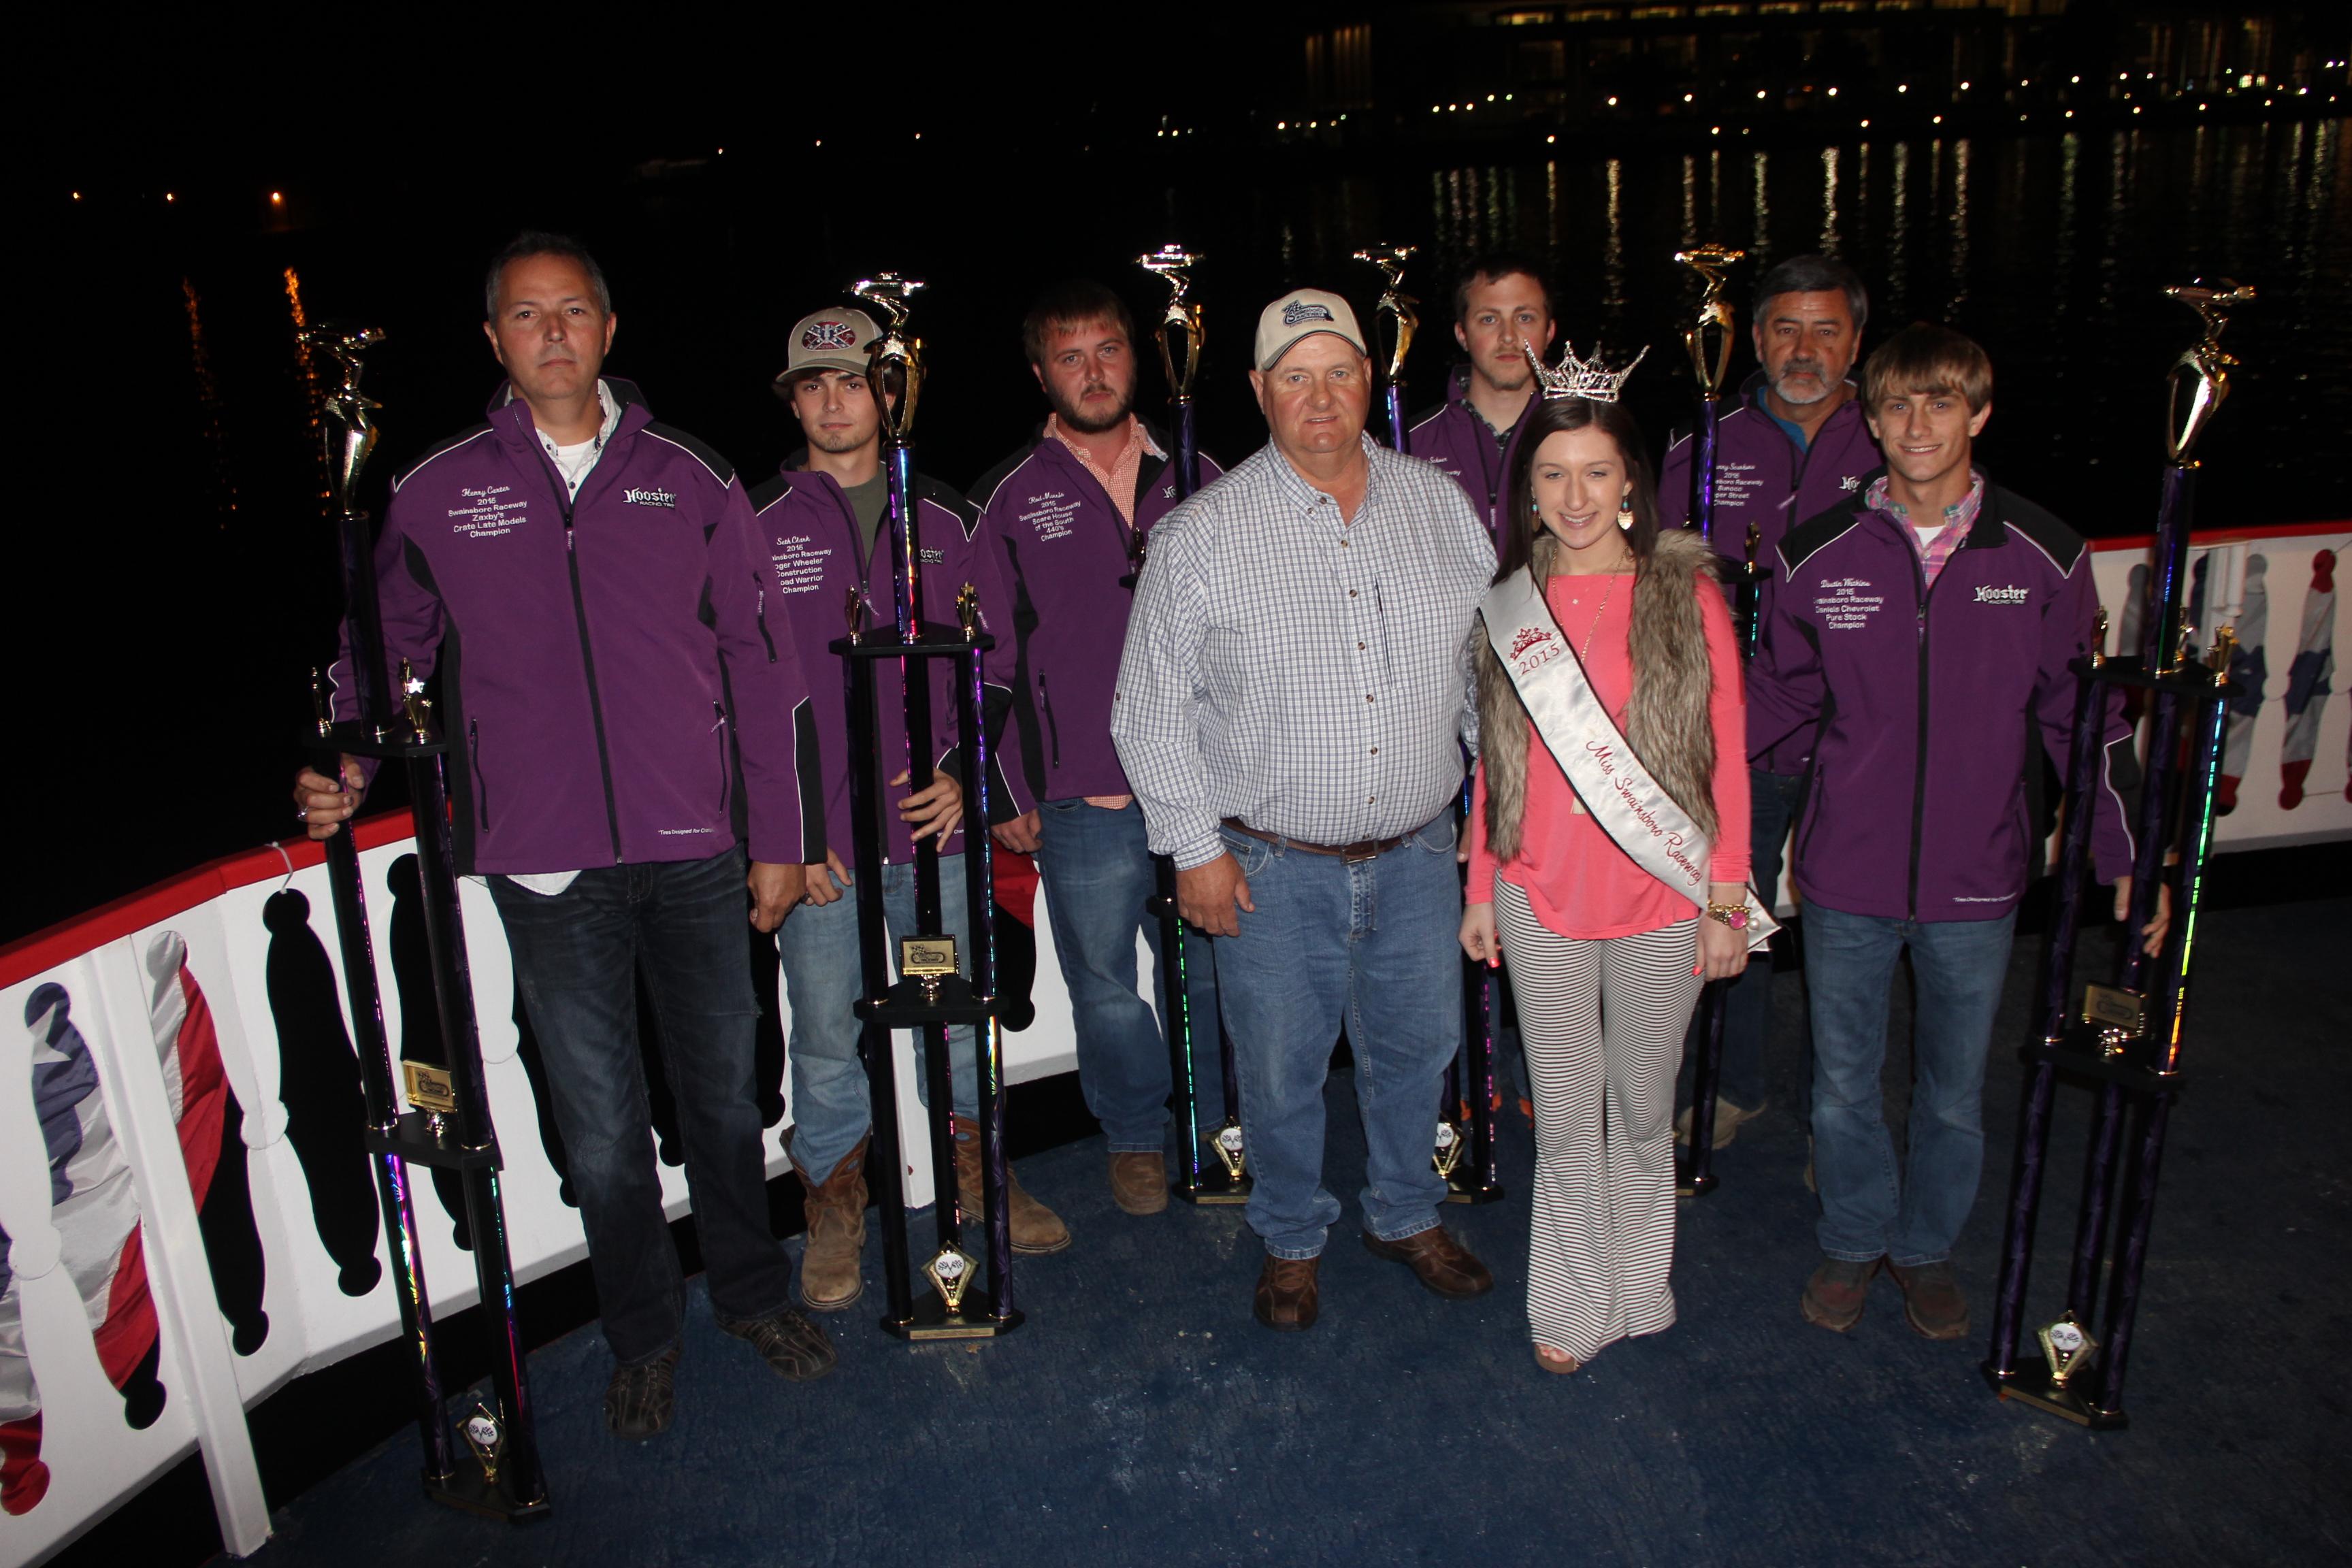 Swainsboro Raceway Celebrates season aboard Savannah River Queen!